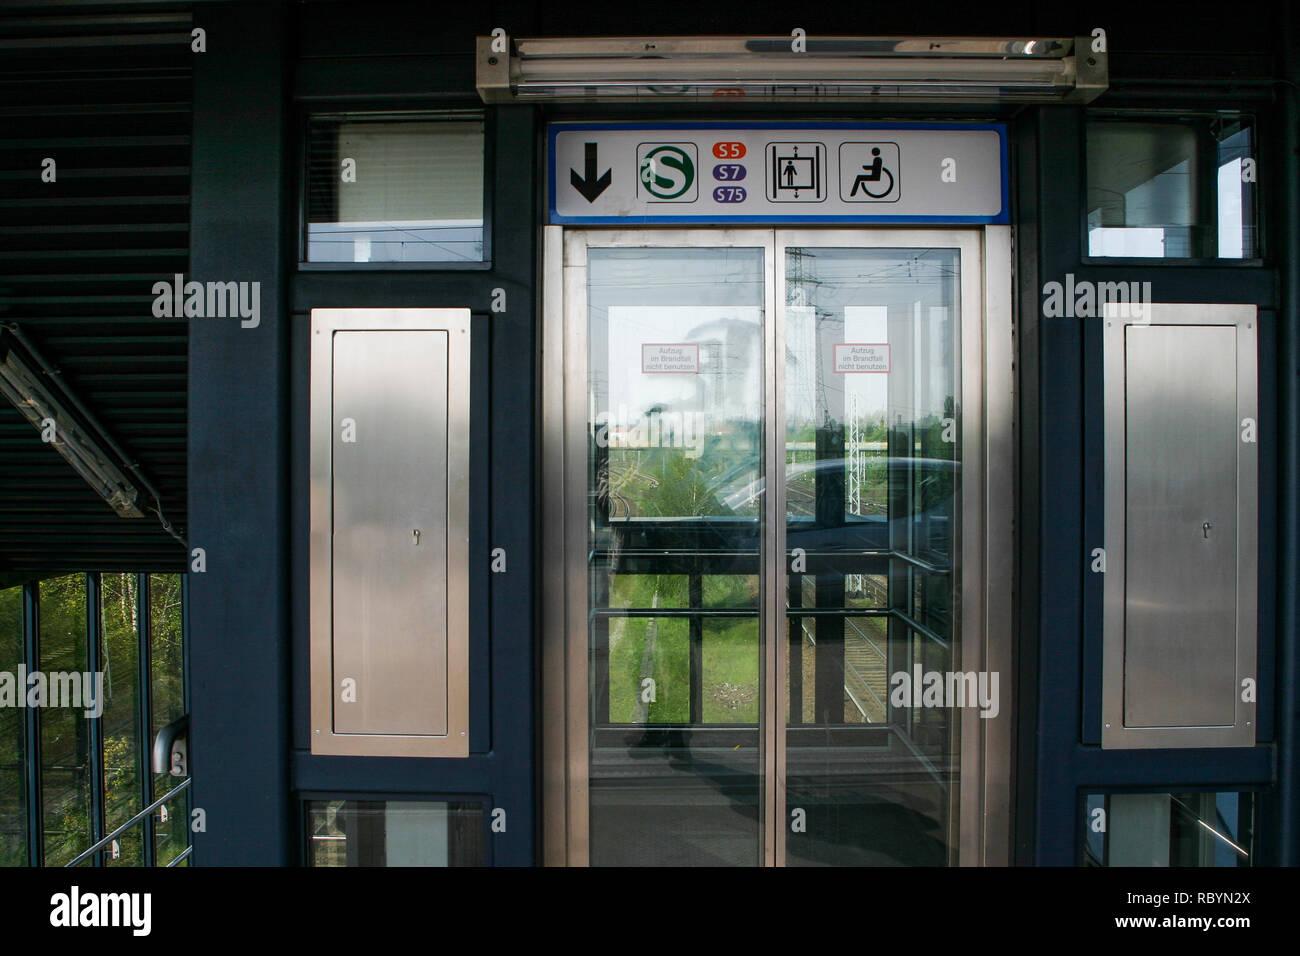 S-Bahn elevator, Berlin, Germany Stock Photo